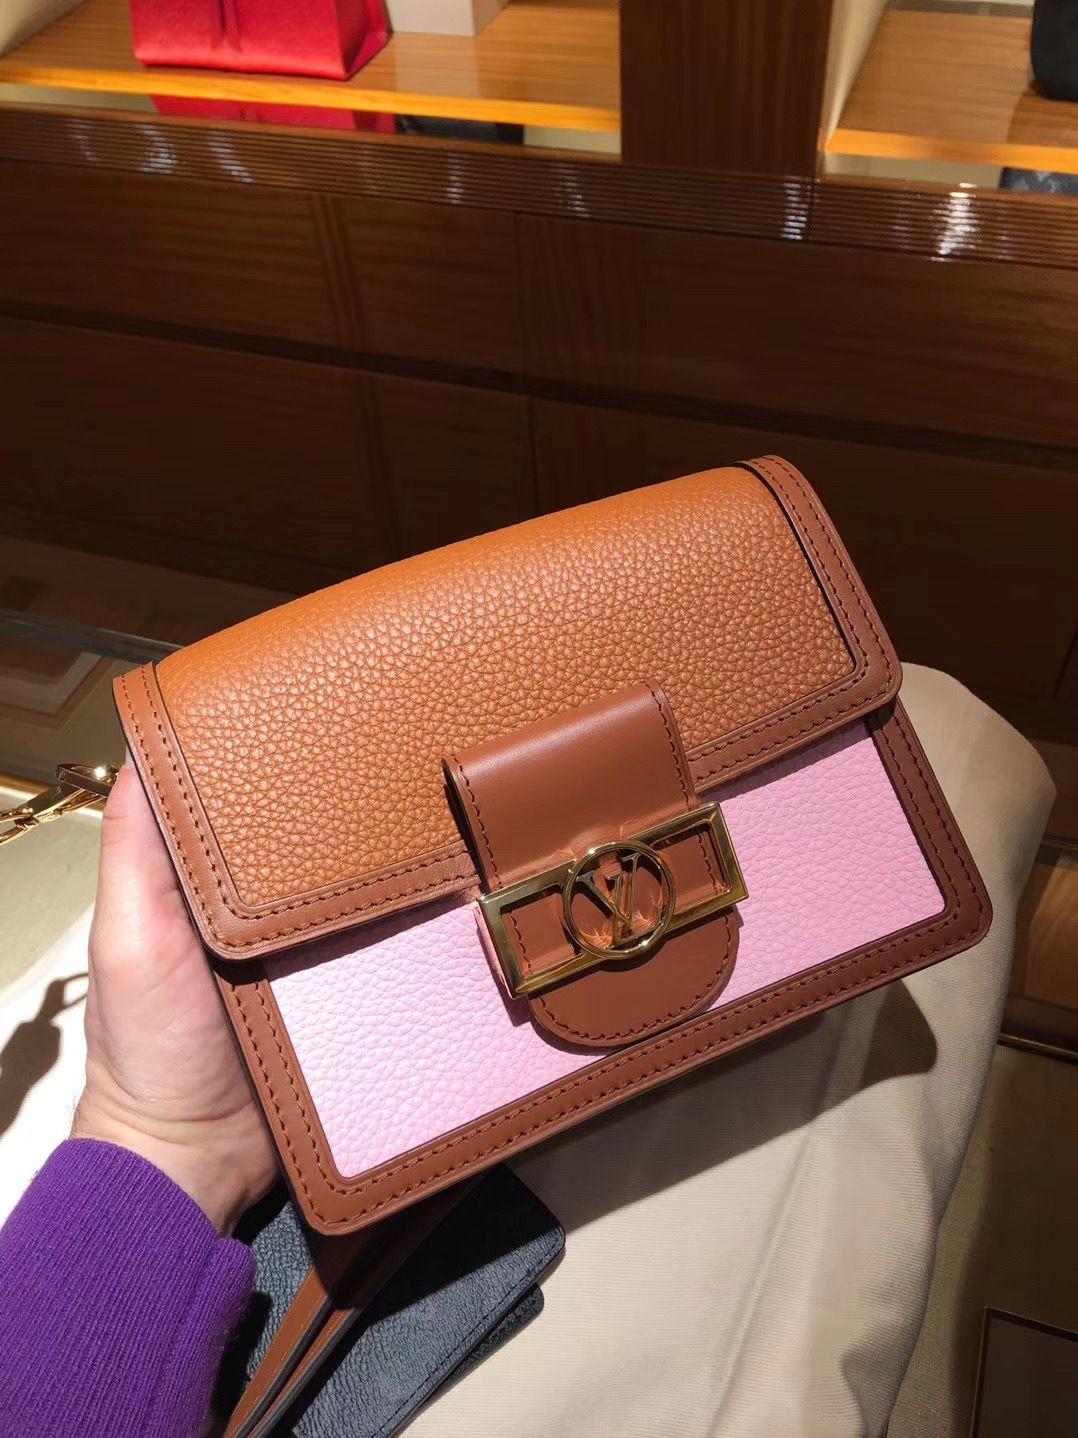 720ab6c33bd Louis Vuitton Mini Dauphine Bag M53805 #louisvuittondauphine #lvdauphine  #lvpurses #louisvuittonpurses #m53805